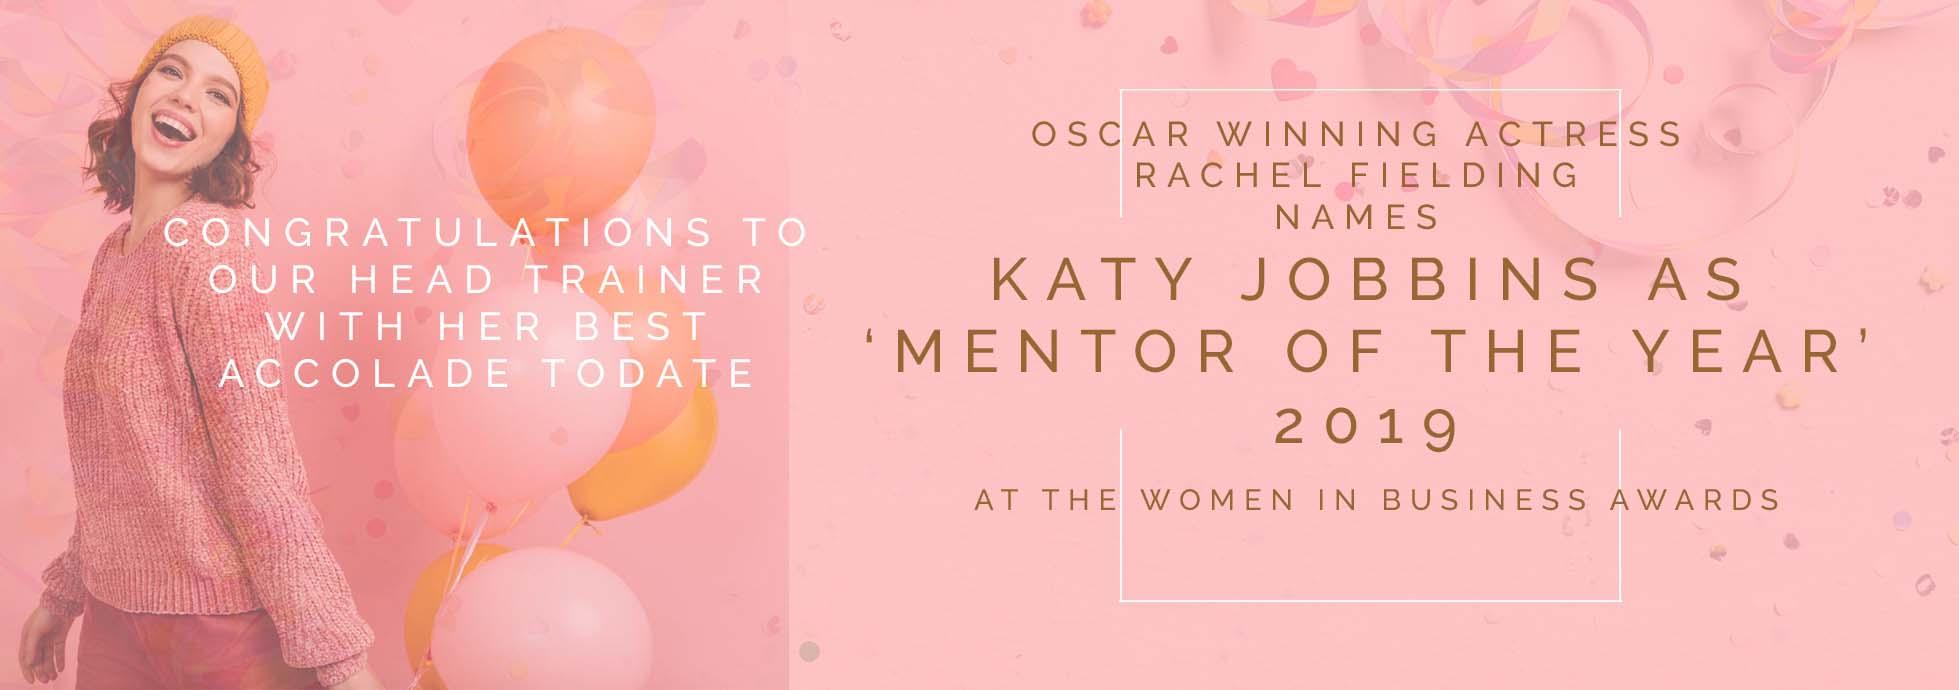 Katy-Jobbins-named-Mentor-of-the-Year